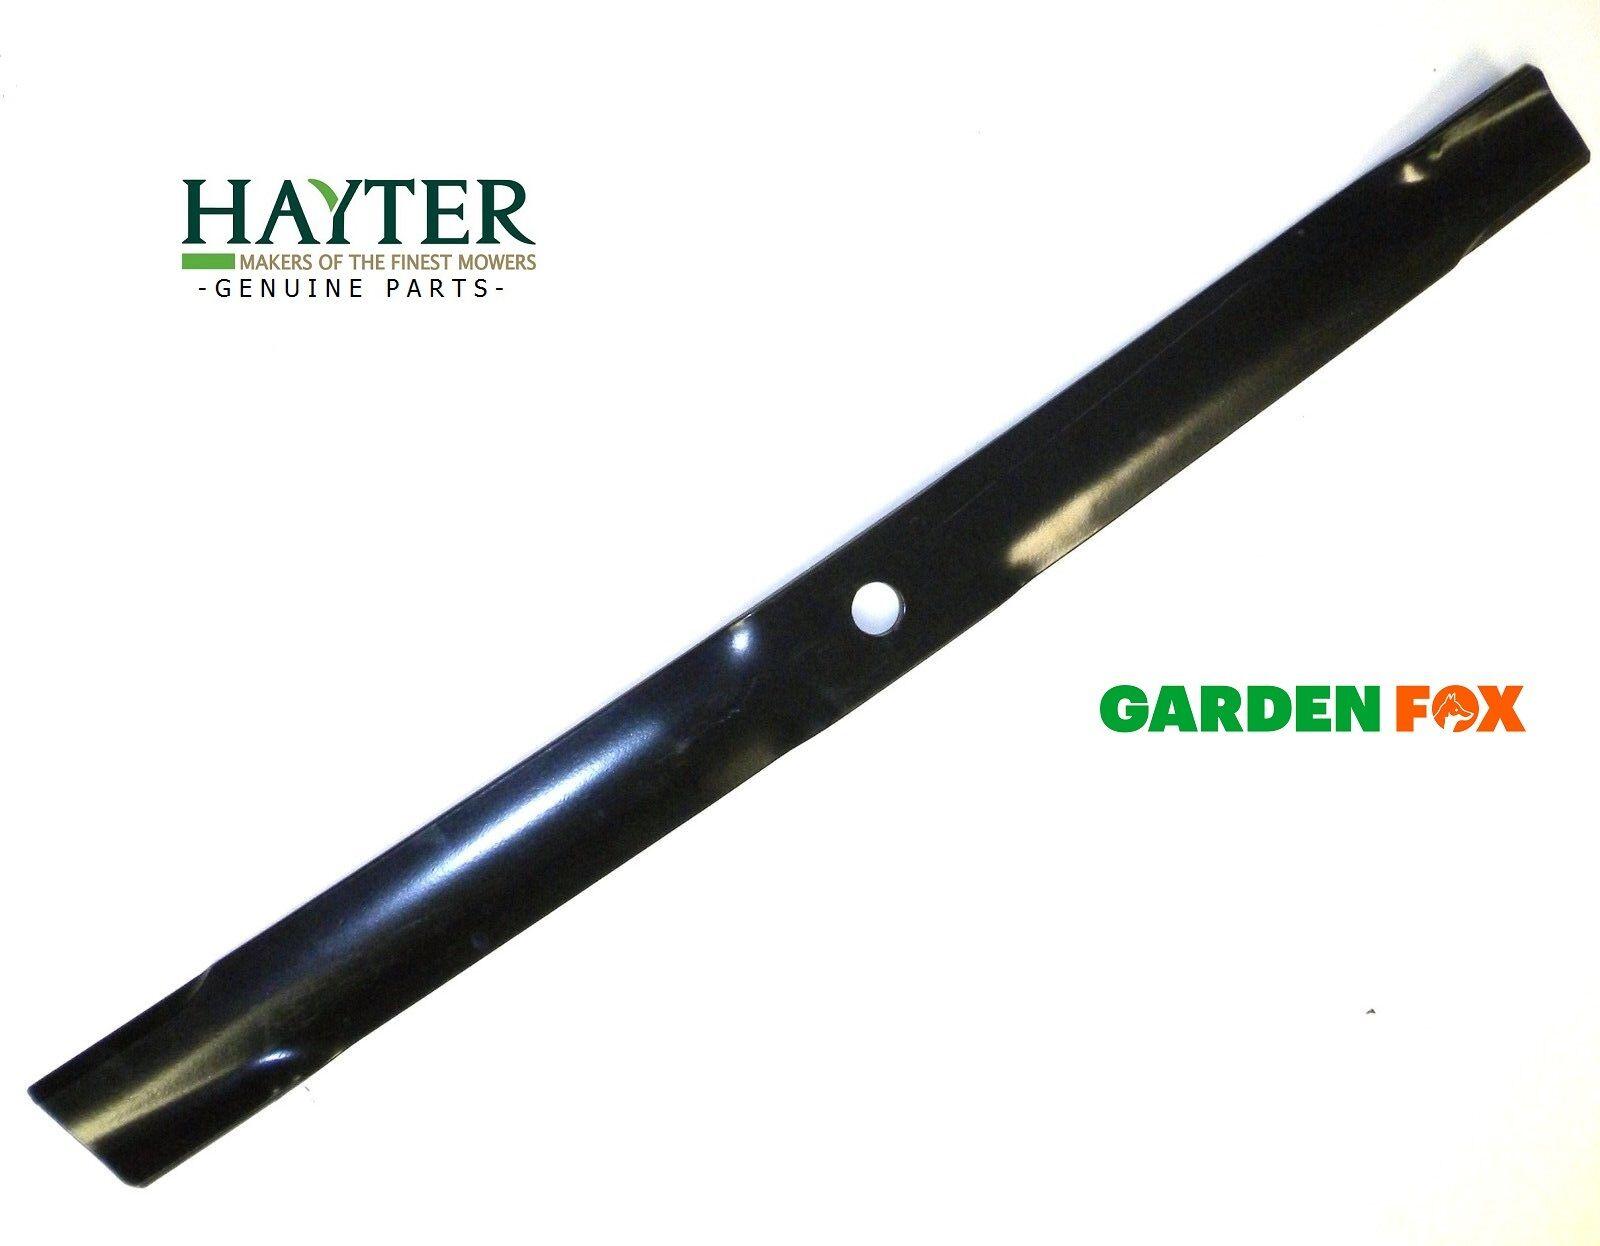 Ahorradores-HAYTER HERITAGE Desbrozadora Hoja 130S 10 30 MU56217E701MA 056217E701MA 1253